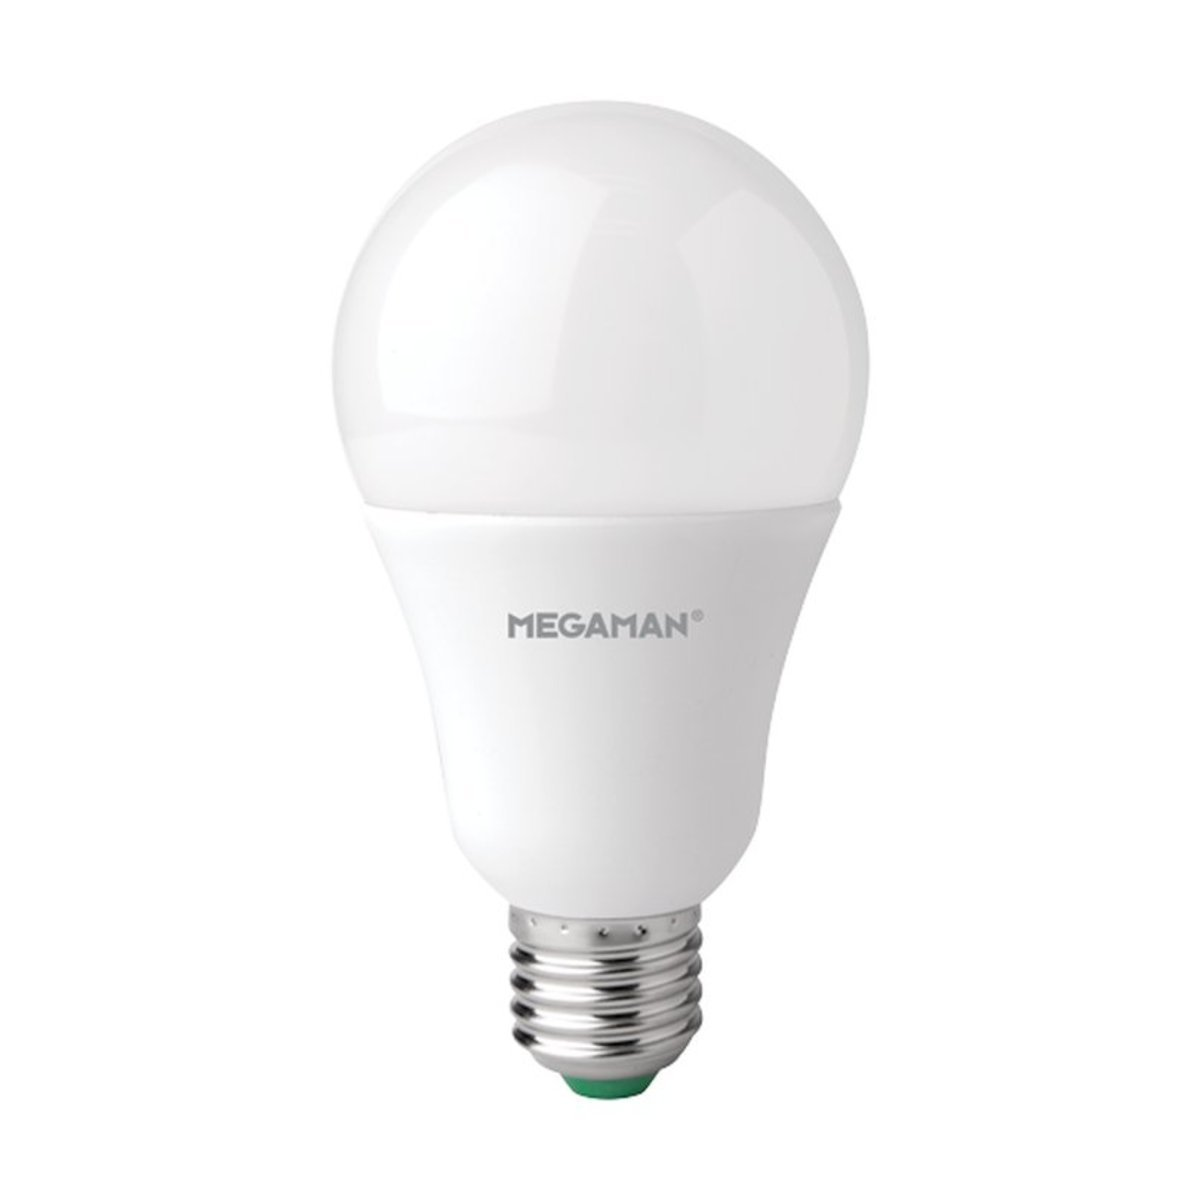 曼佳美 LED 14W E27 6500K 球型 燈膽 冷日光